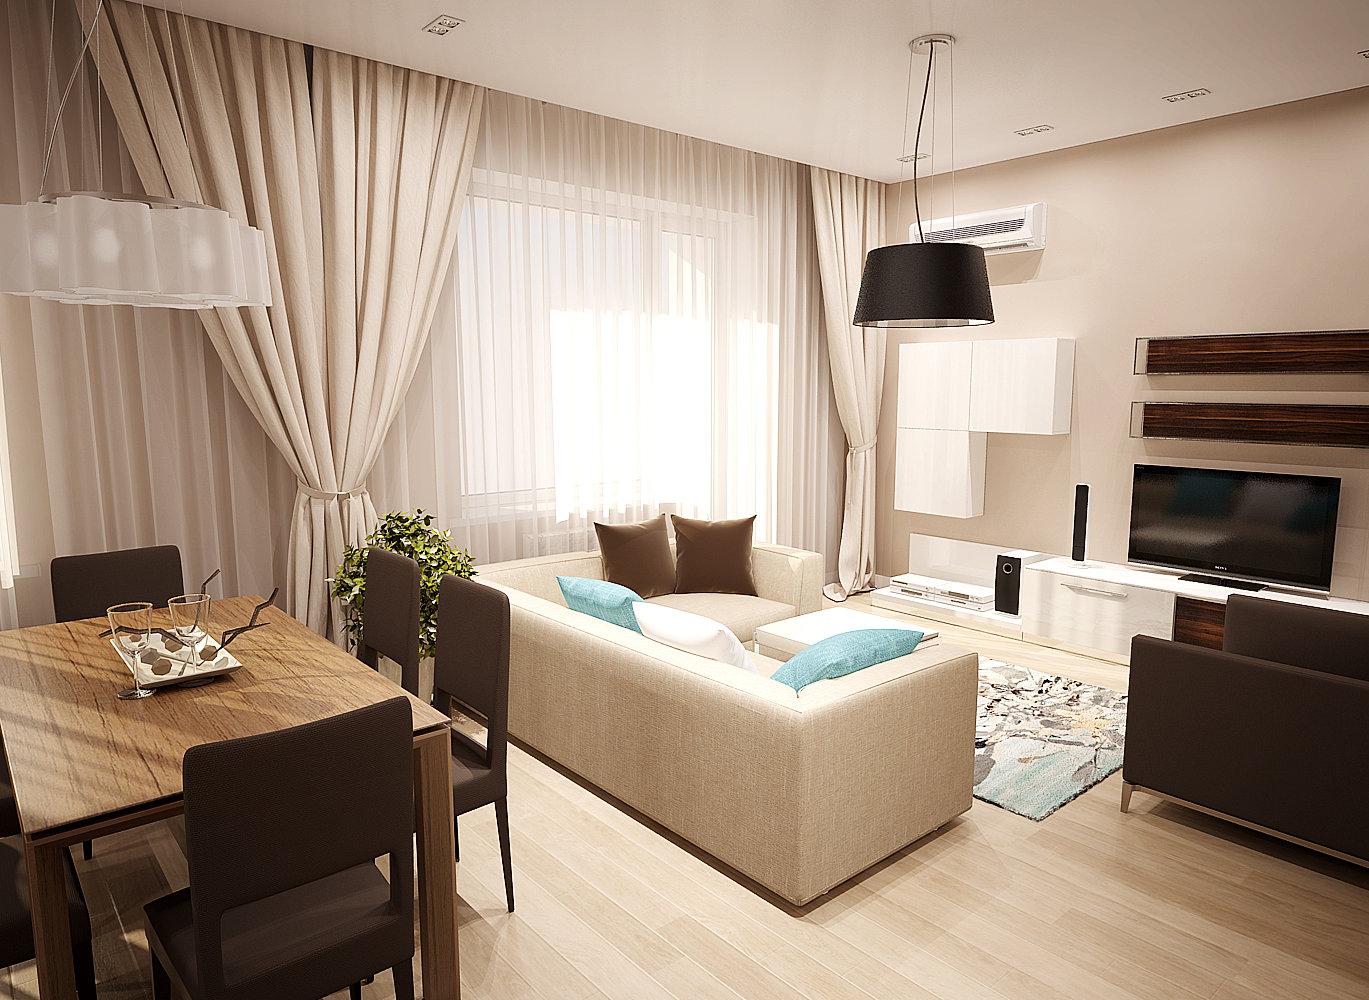 Дизайн комнаты 20 кв.м с двумя окнами